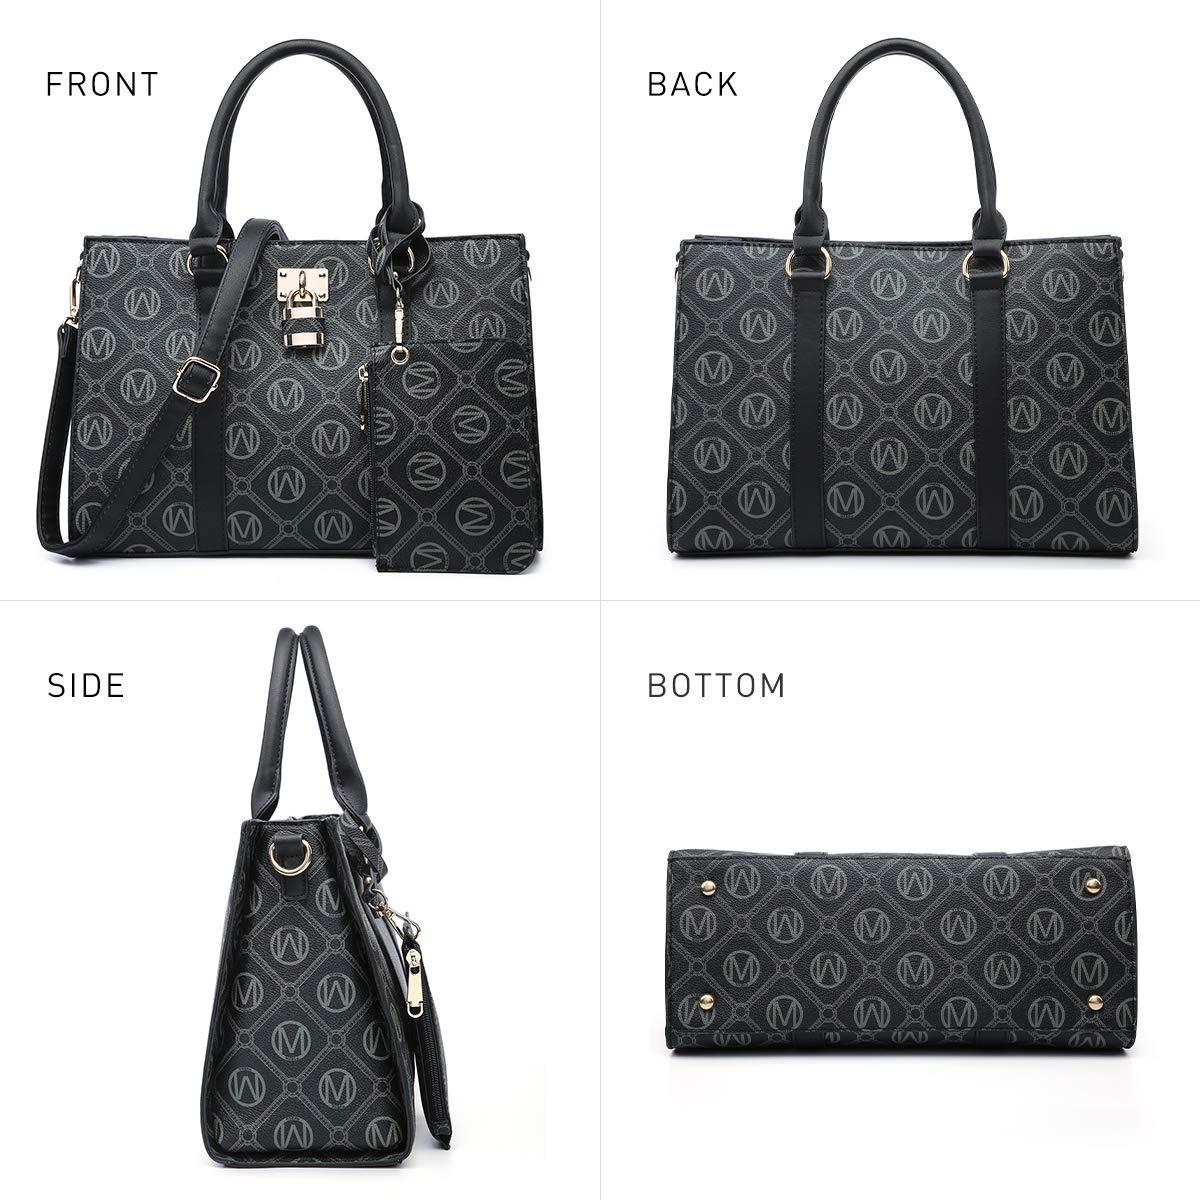 MKP Women Fashion Top Handle Handbags Purses Satchel Tote M Signature Padlock Shouler Bags Work Bag with Wallet Wristlet Set 2pcs (Black)